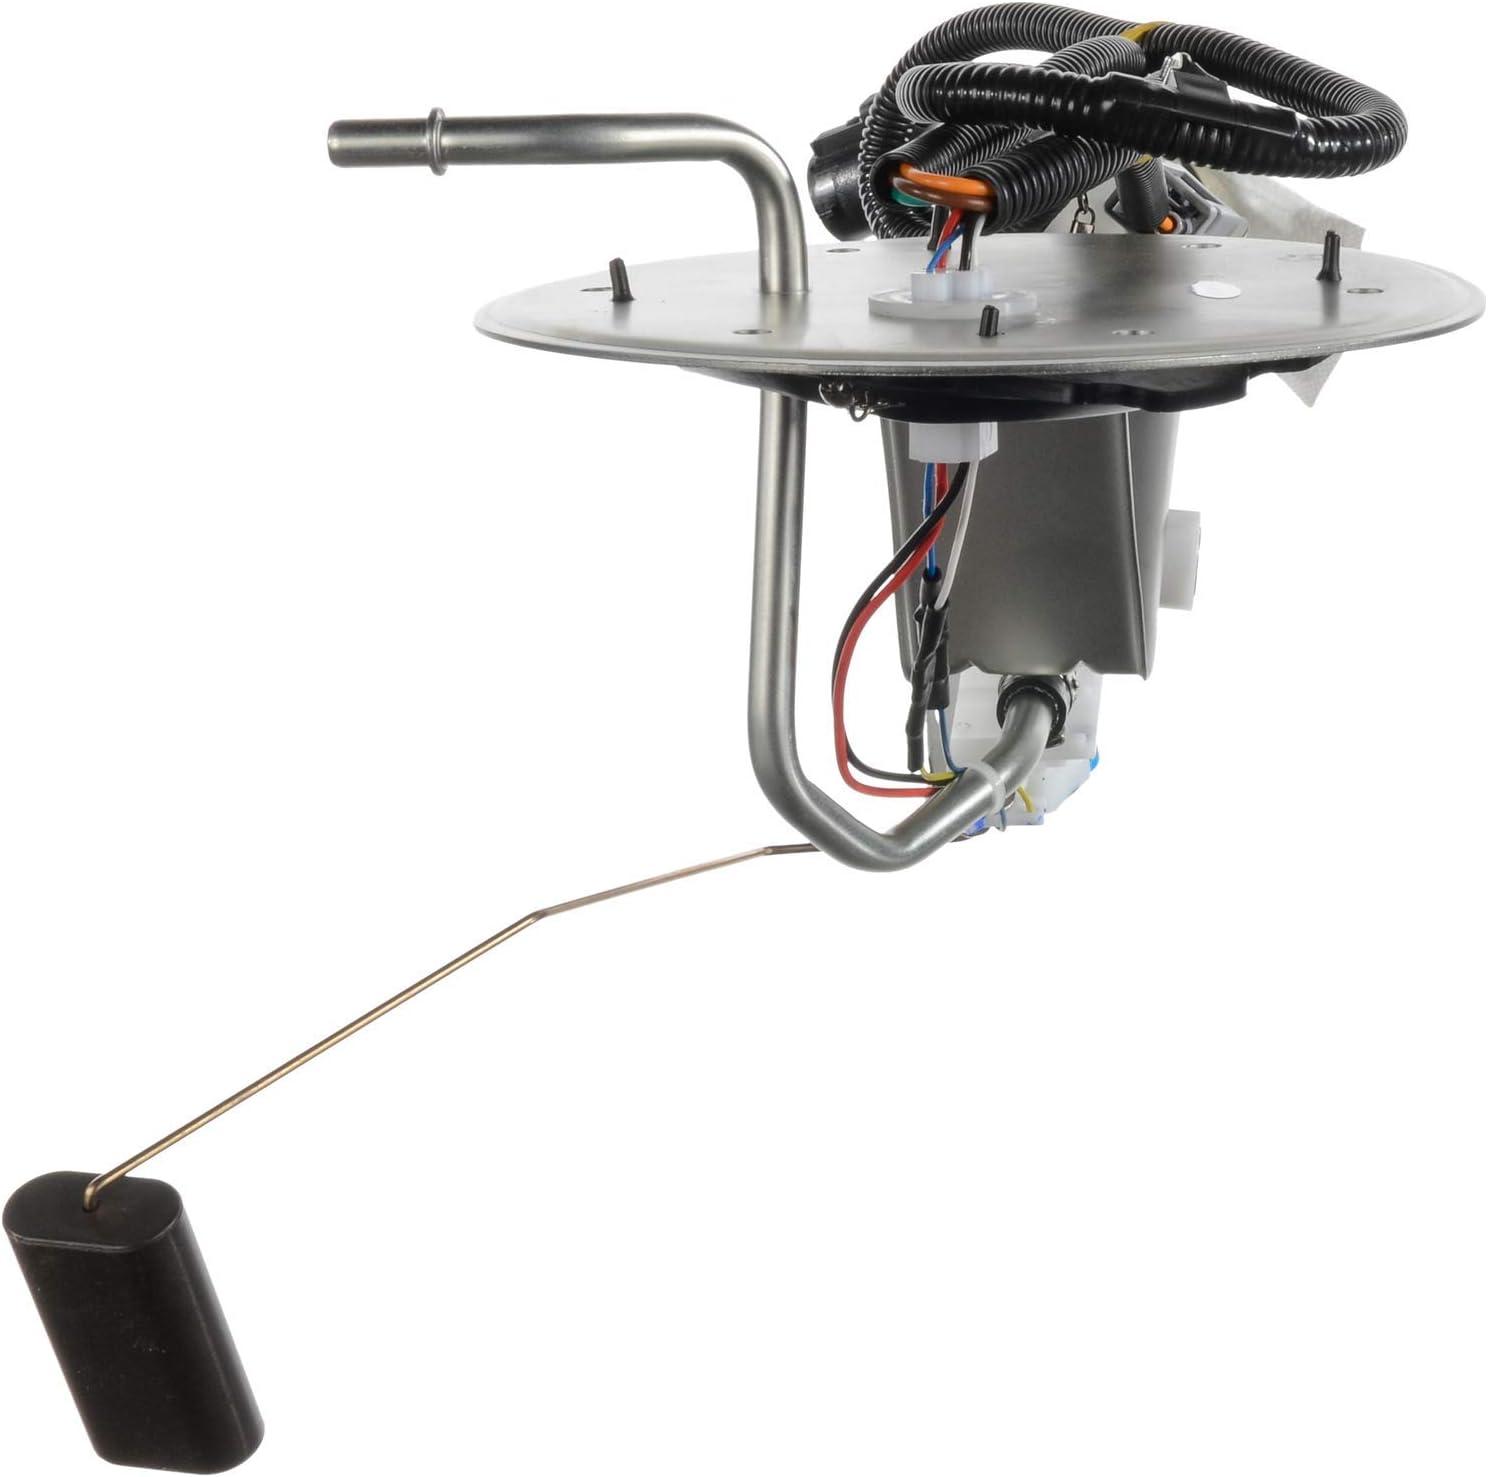 Bosch Fuel Pump Sender 67249 For Ford Mercury Lincoln 2003-2004